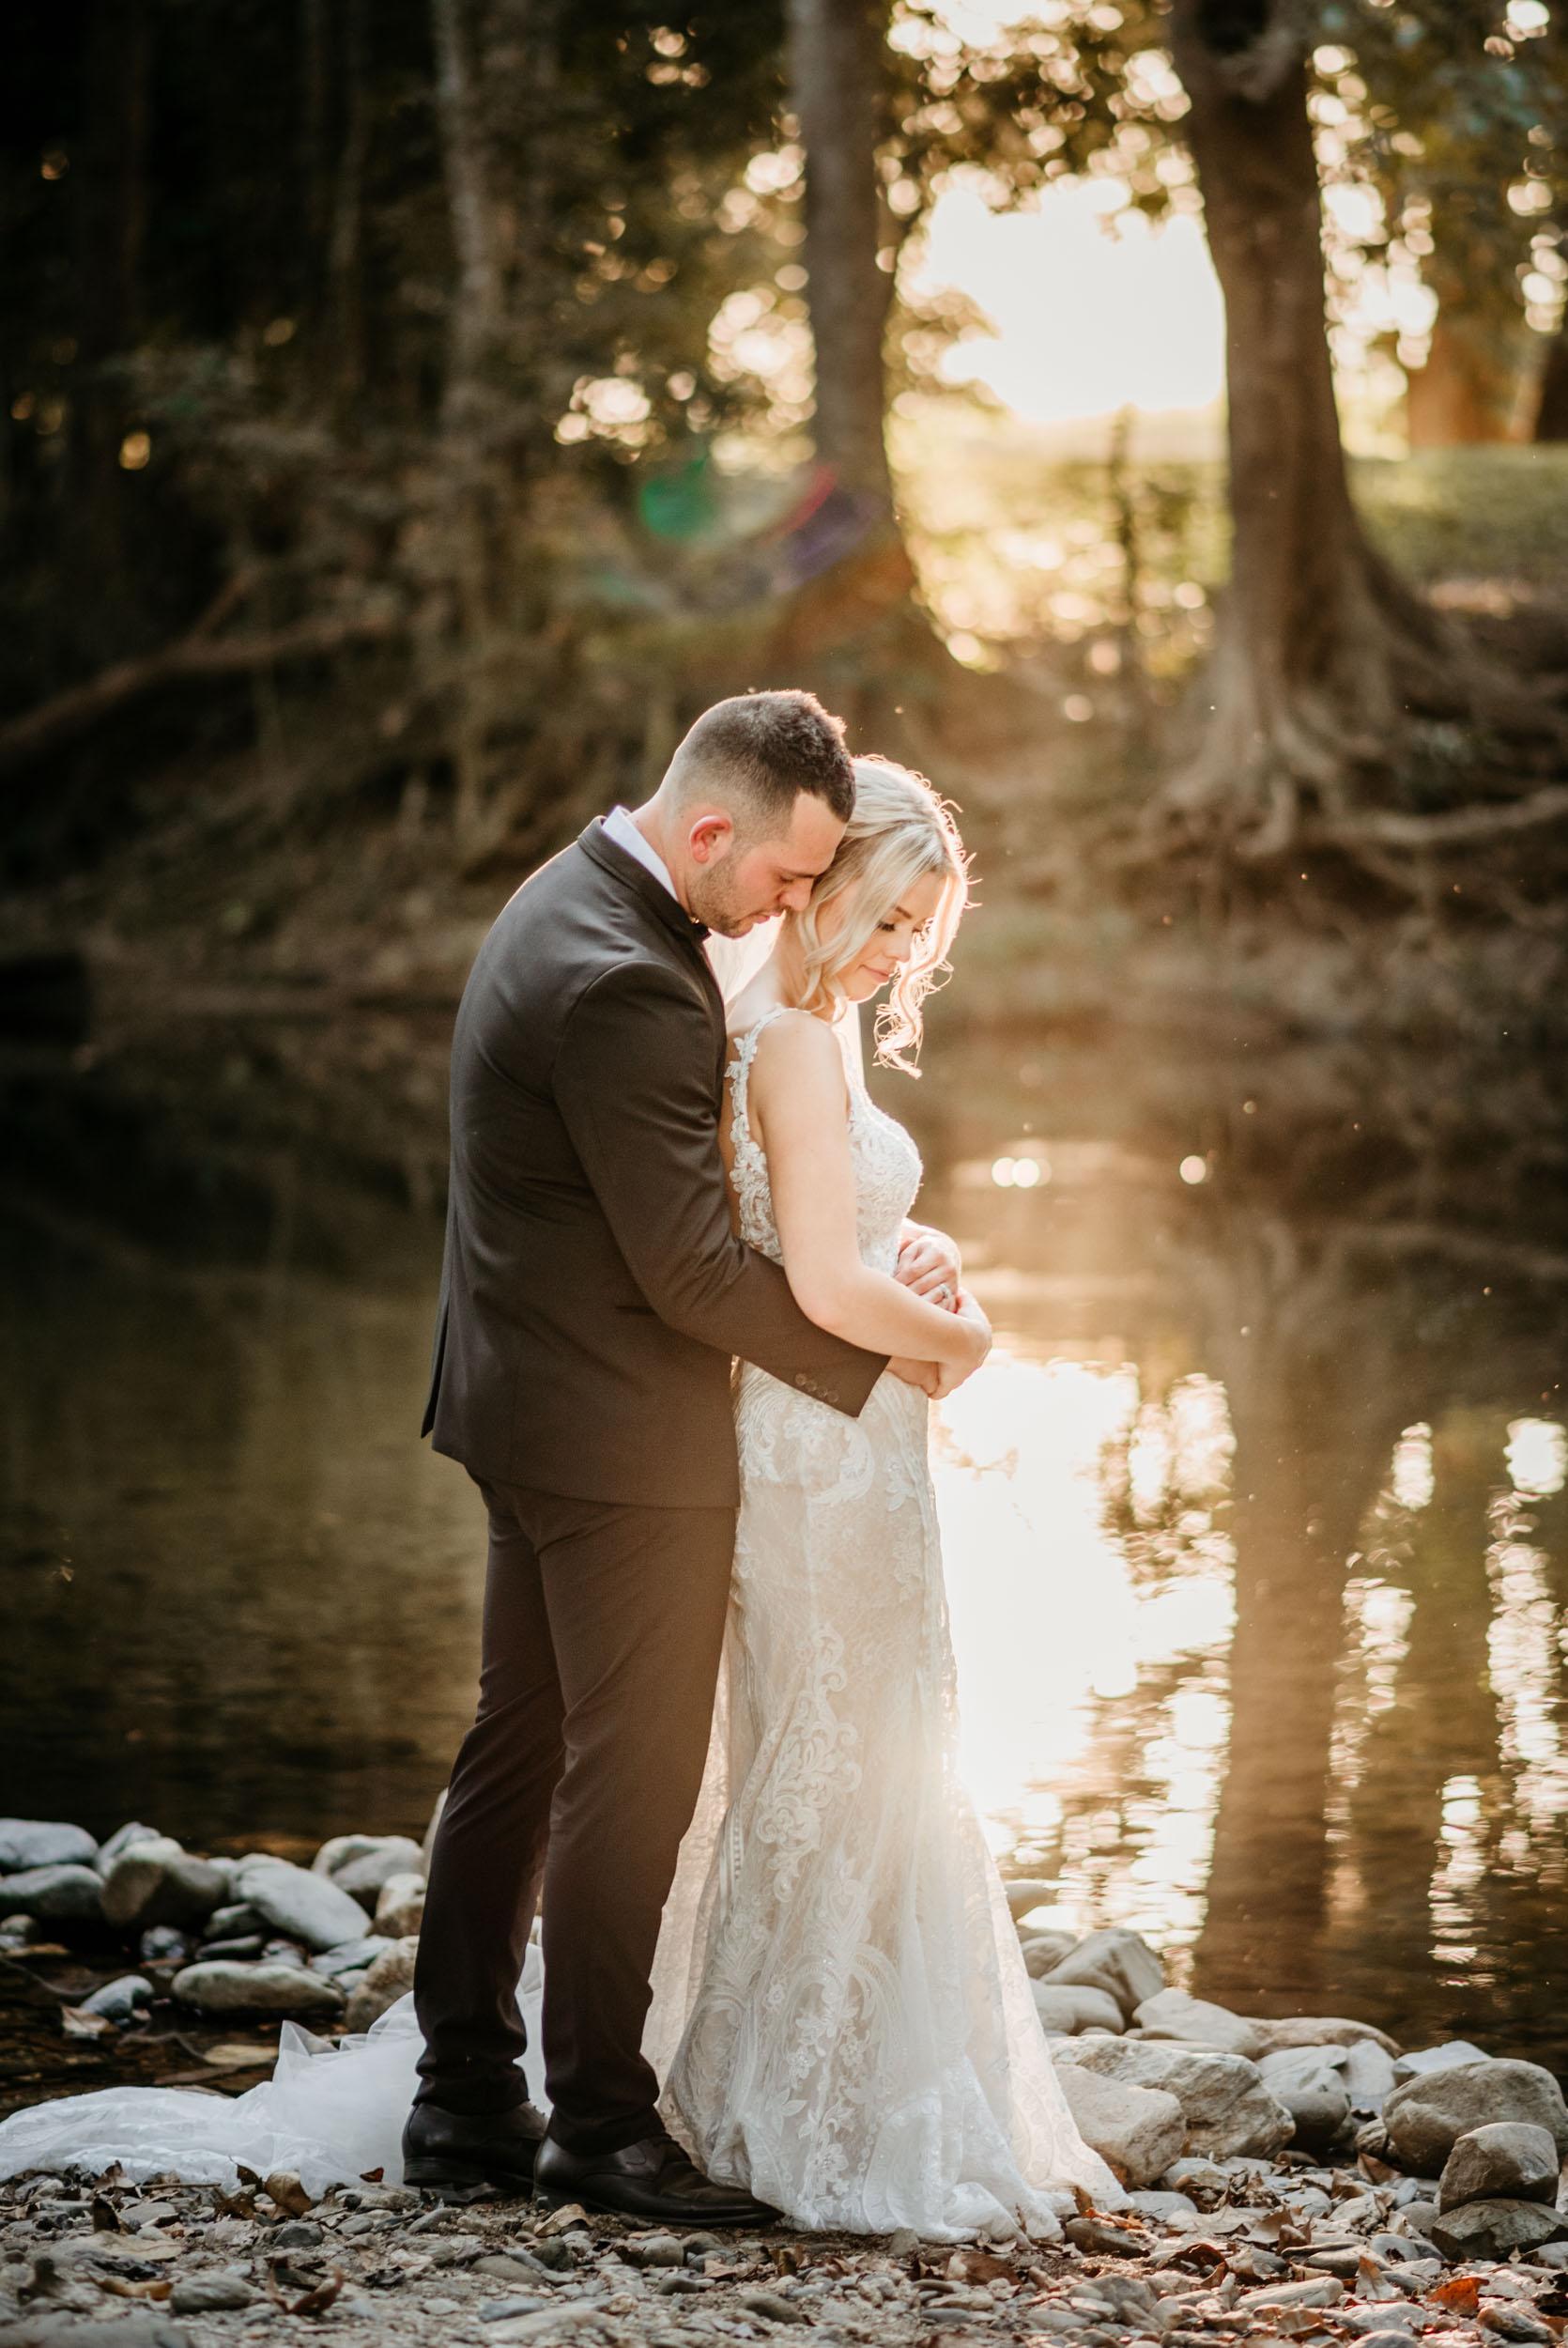 The Raw Photographer - Cairns Wedding Photographer - Laloli - Cairns Garden Wedding - Bride Dress - Destination Wed - Outdoor Reception - Queensland Ceremony-50.jpg